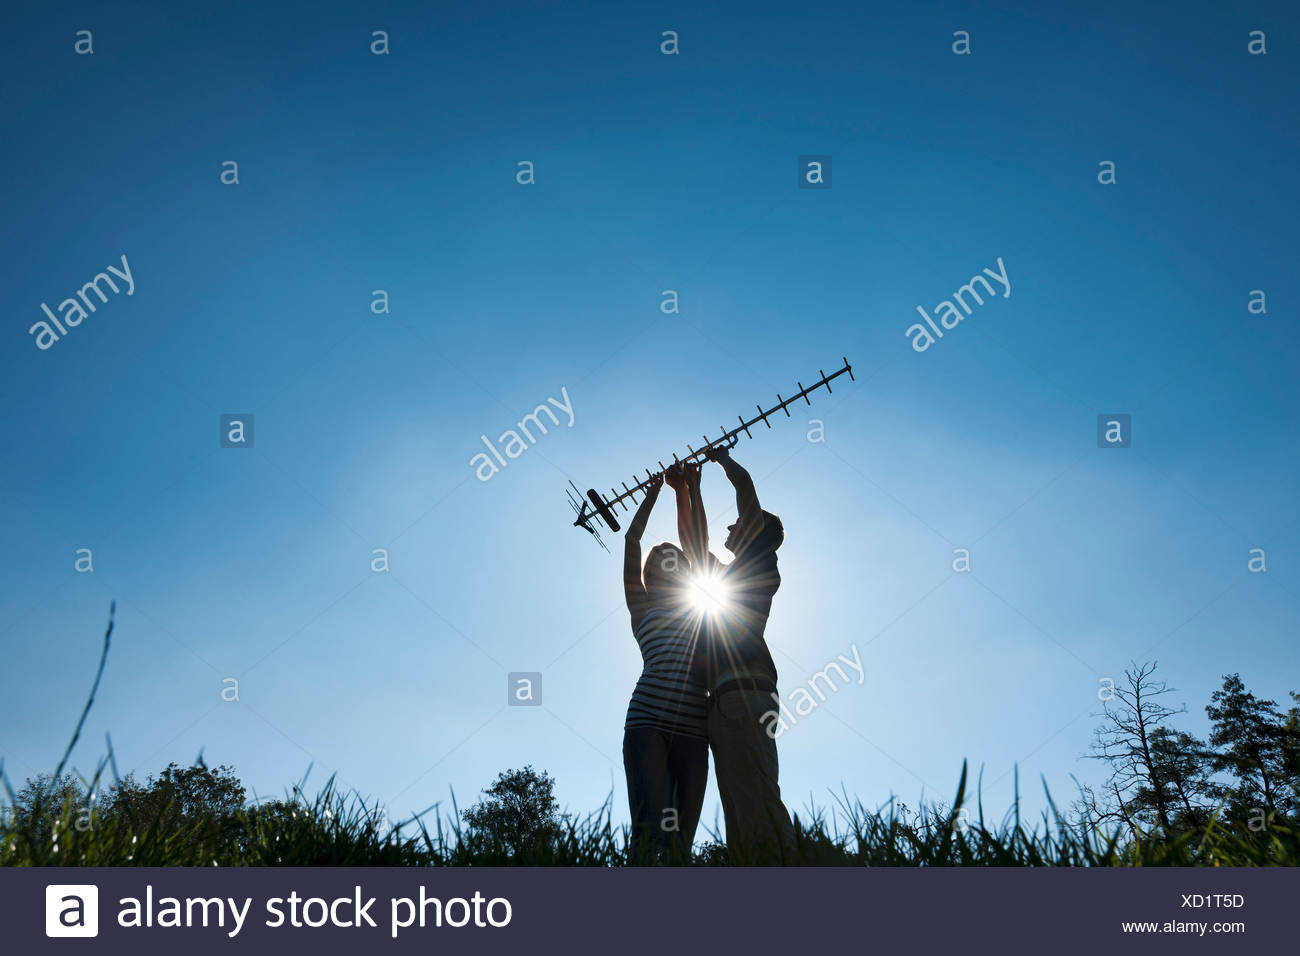 Couple holding up antenna outdoors - Stock Image